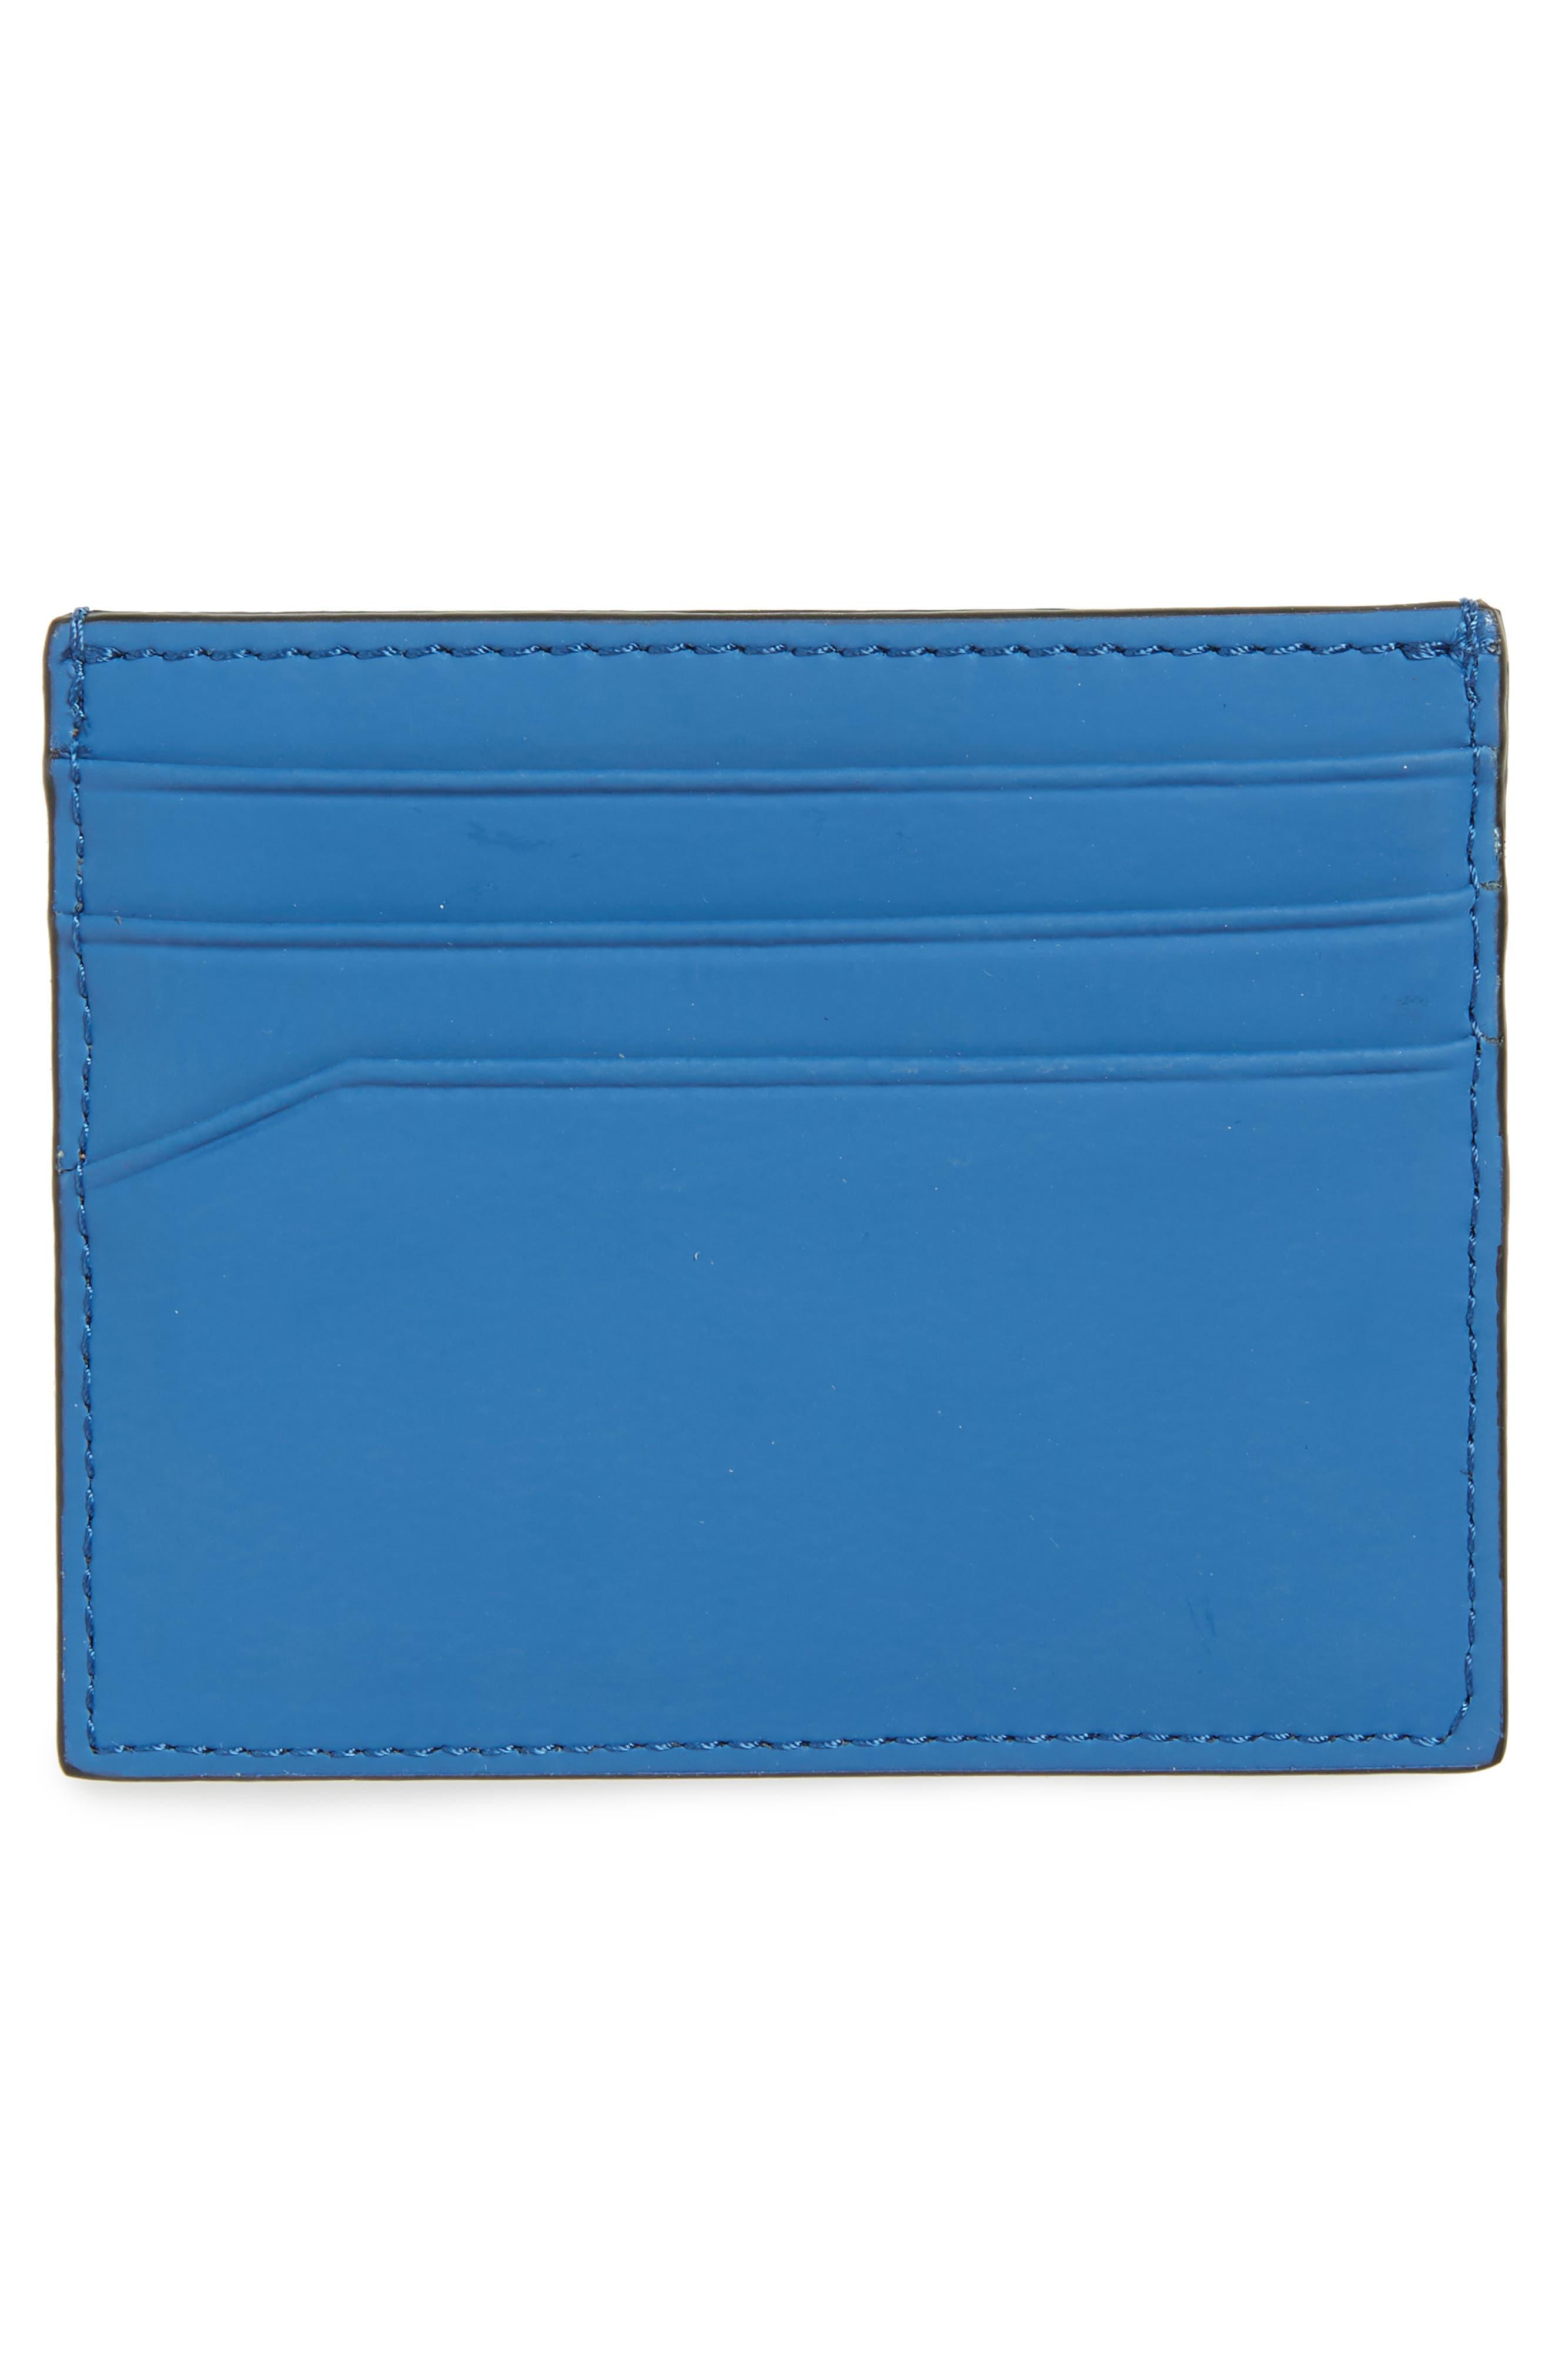 Sands Rubber Leather Card Case,                             Alternate thumbnail 2, color,                             Blue